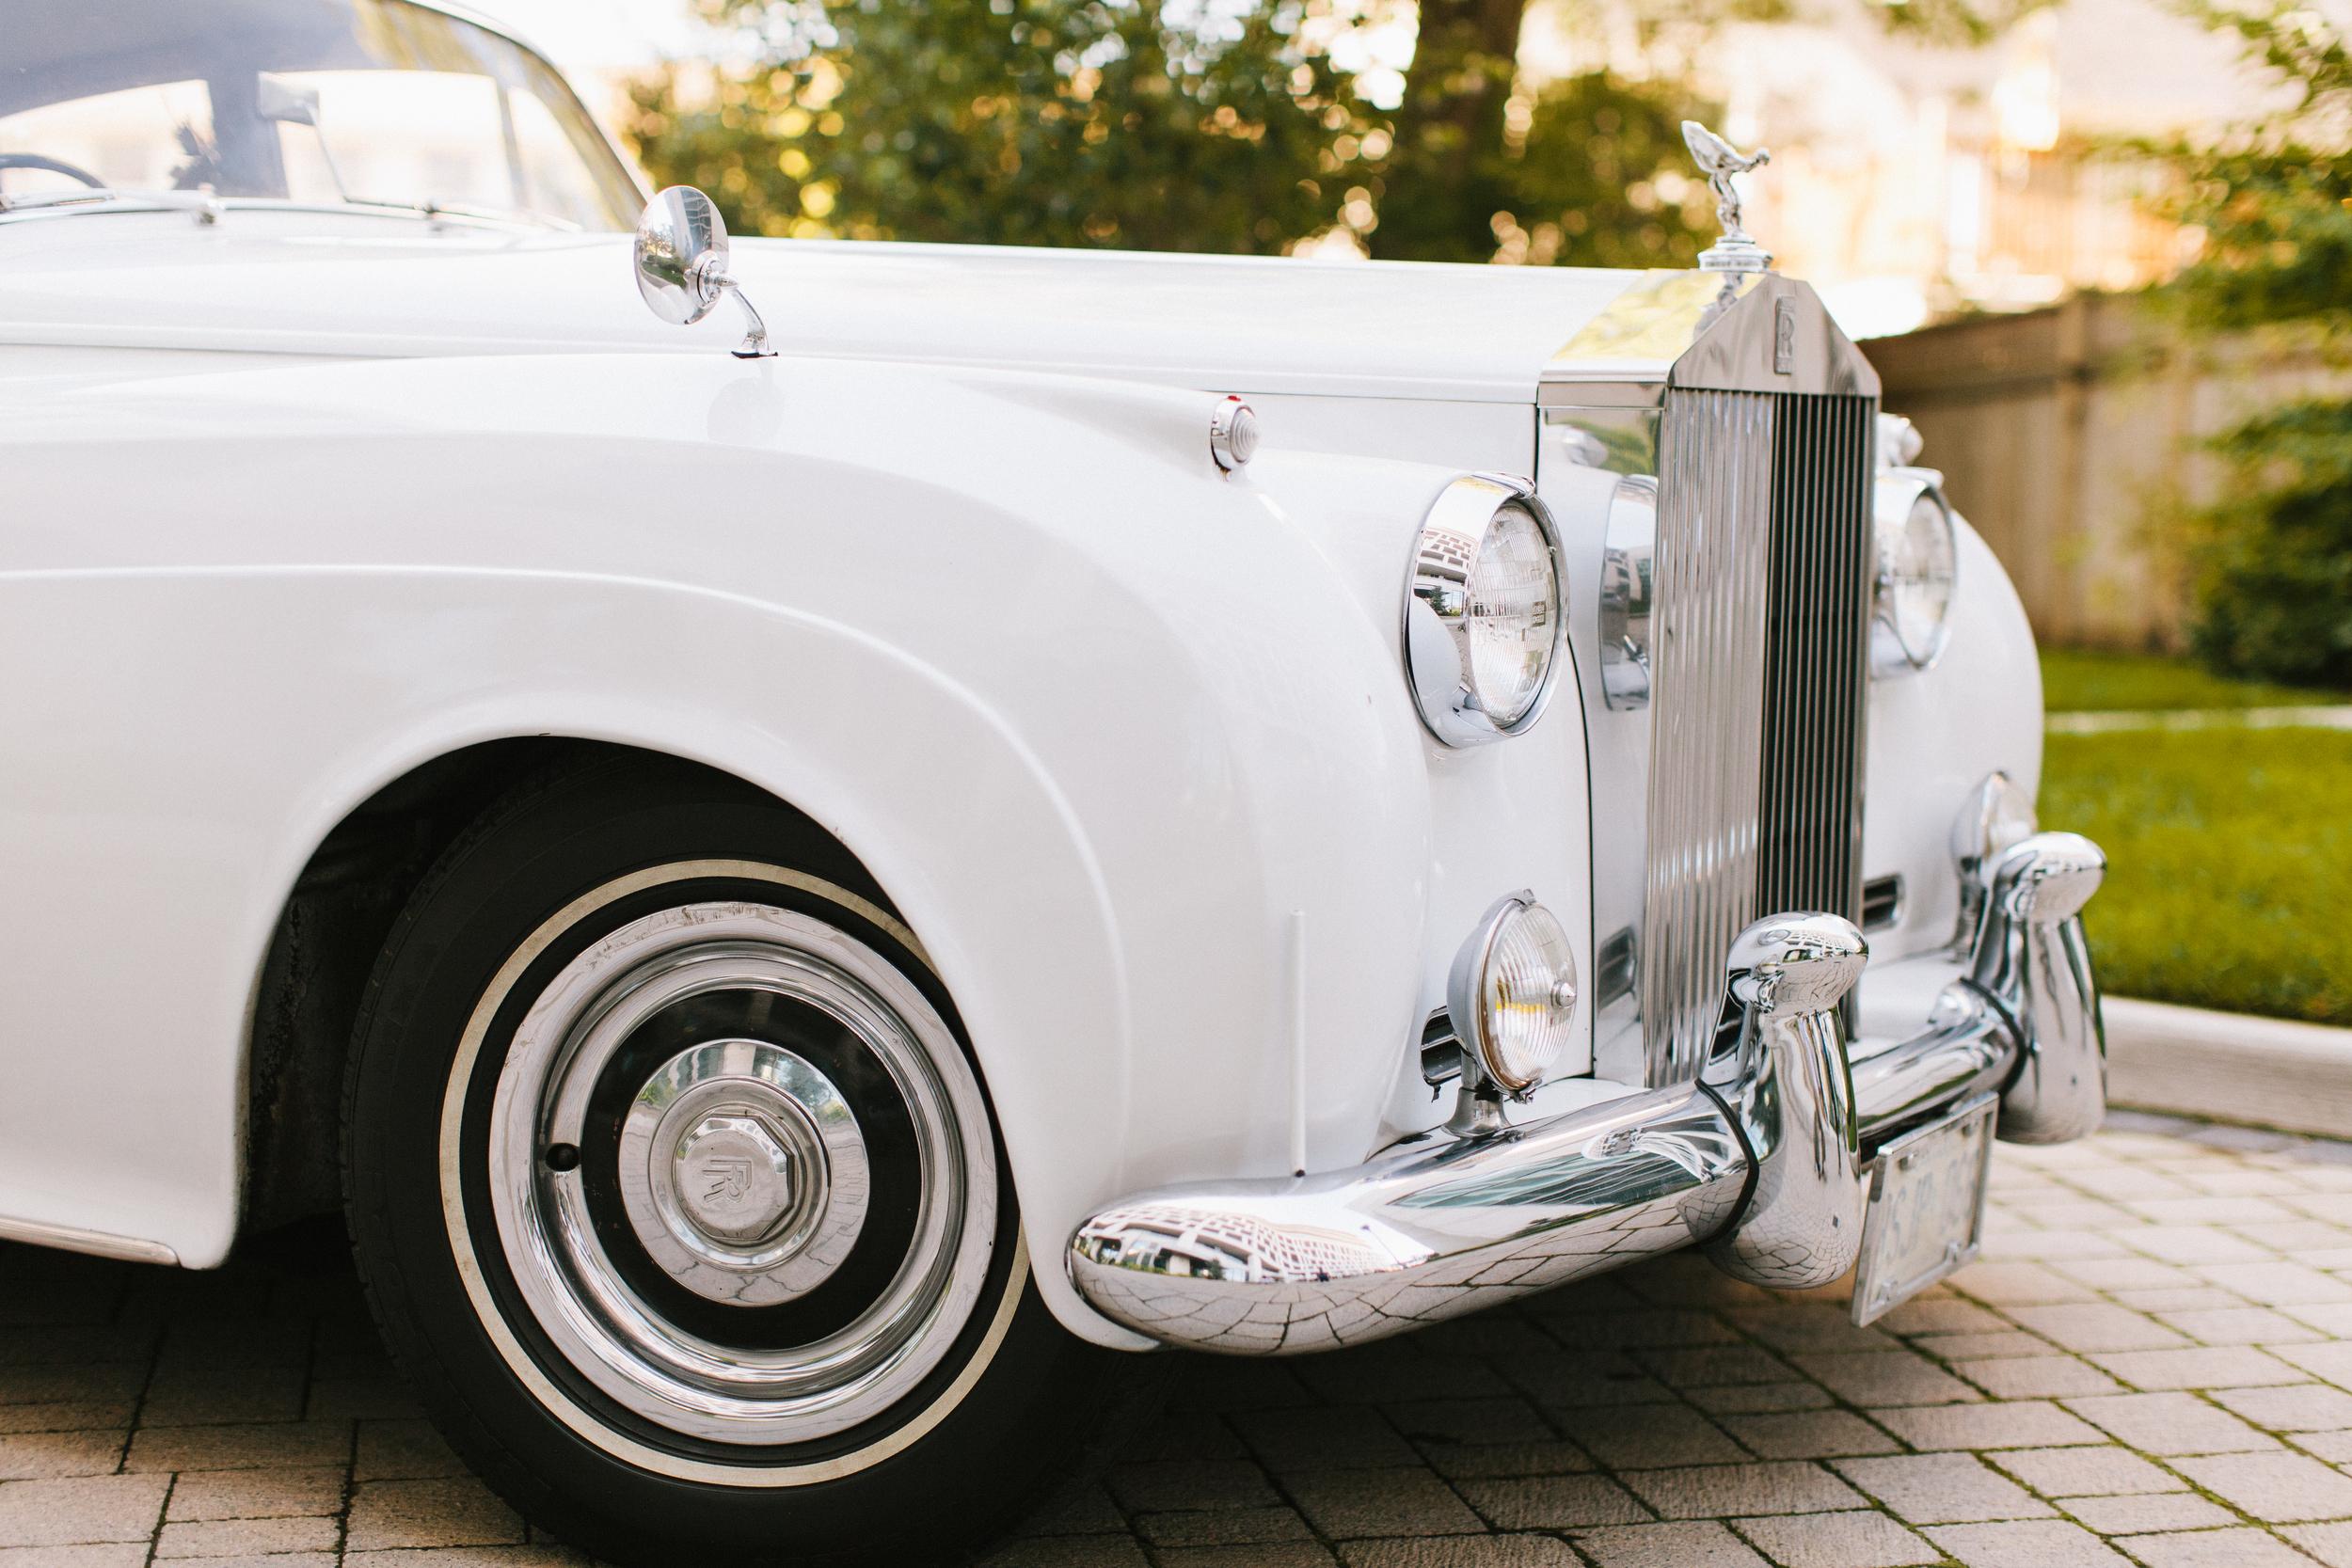 harbour-banquet-hall-oakville-wedding-photographer-michael-rousseau-photography-persian-wedding-photographer-isabella-daniel029.JPG